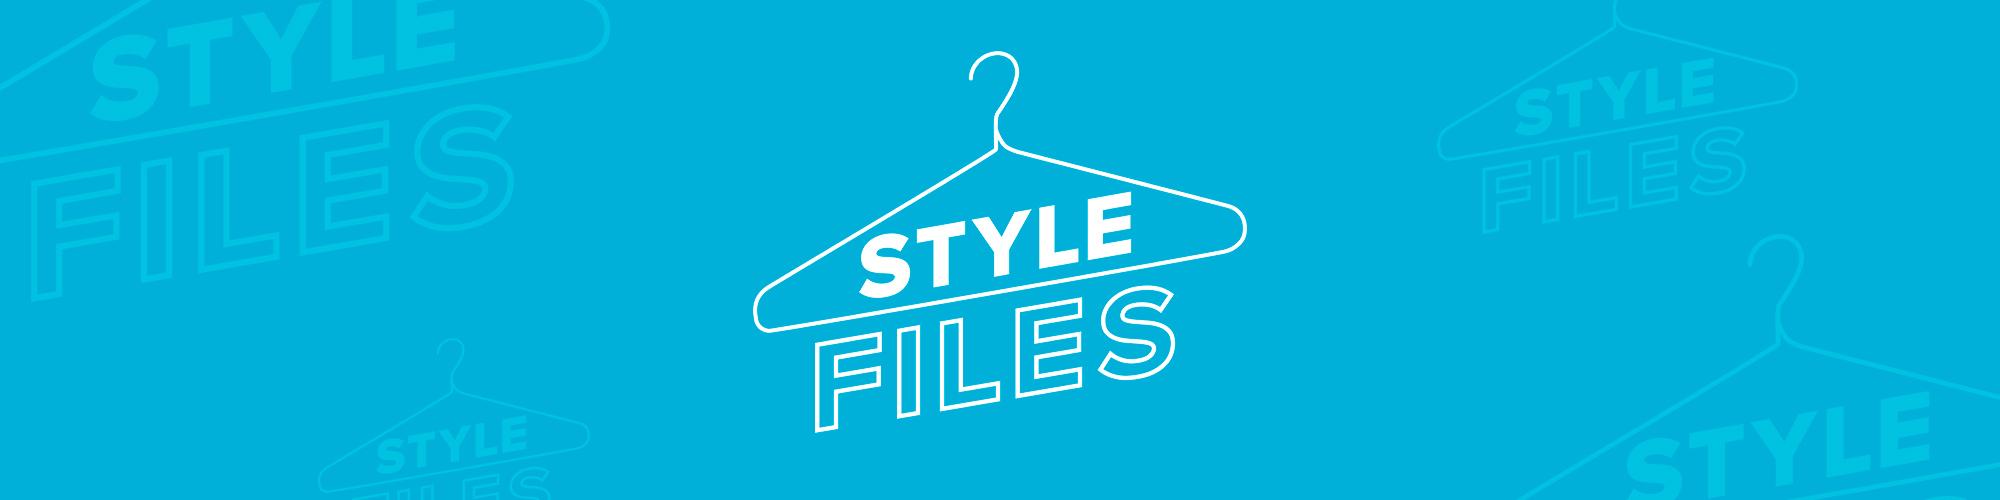 style-files.jpg